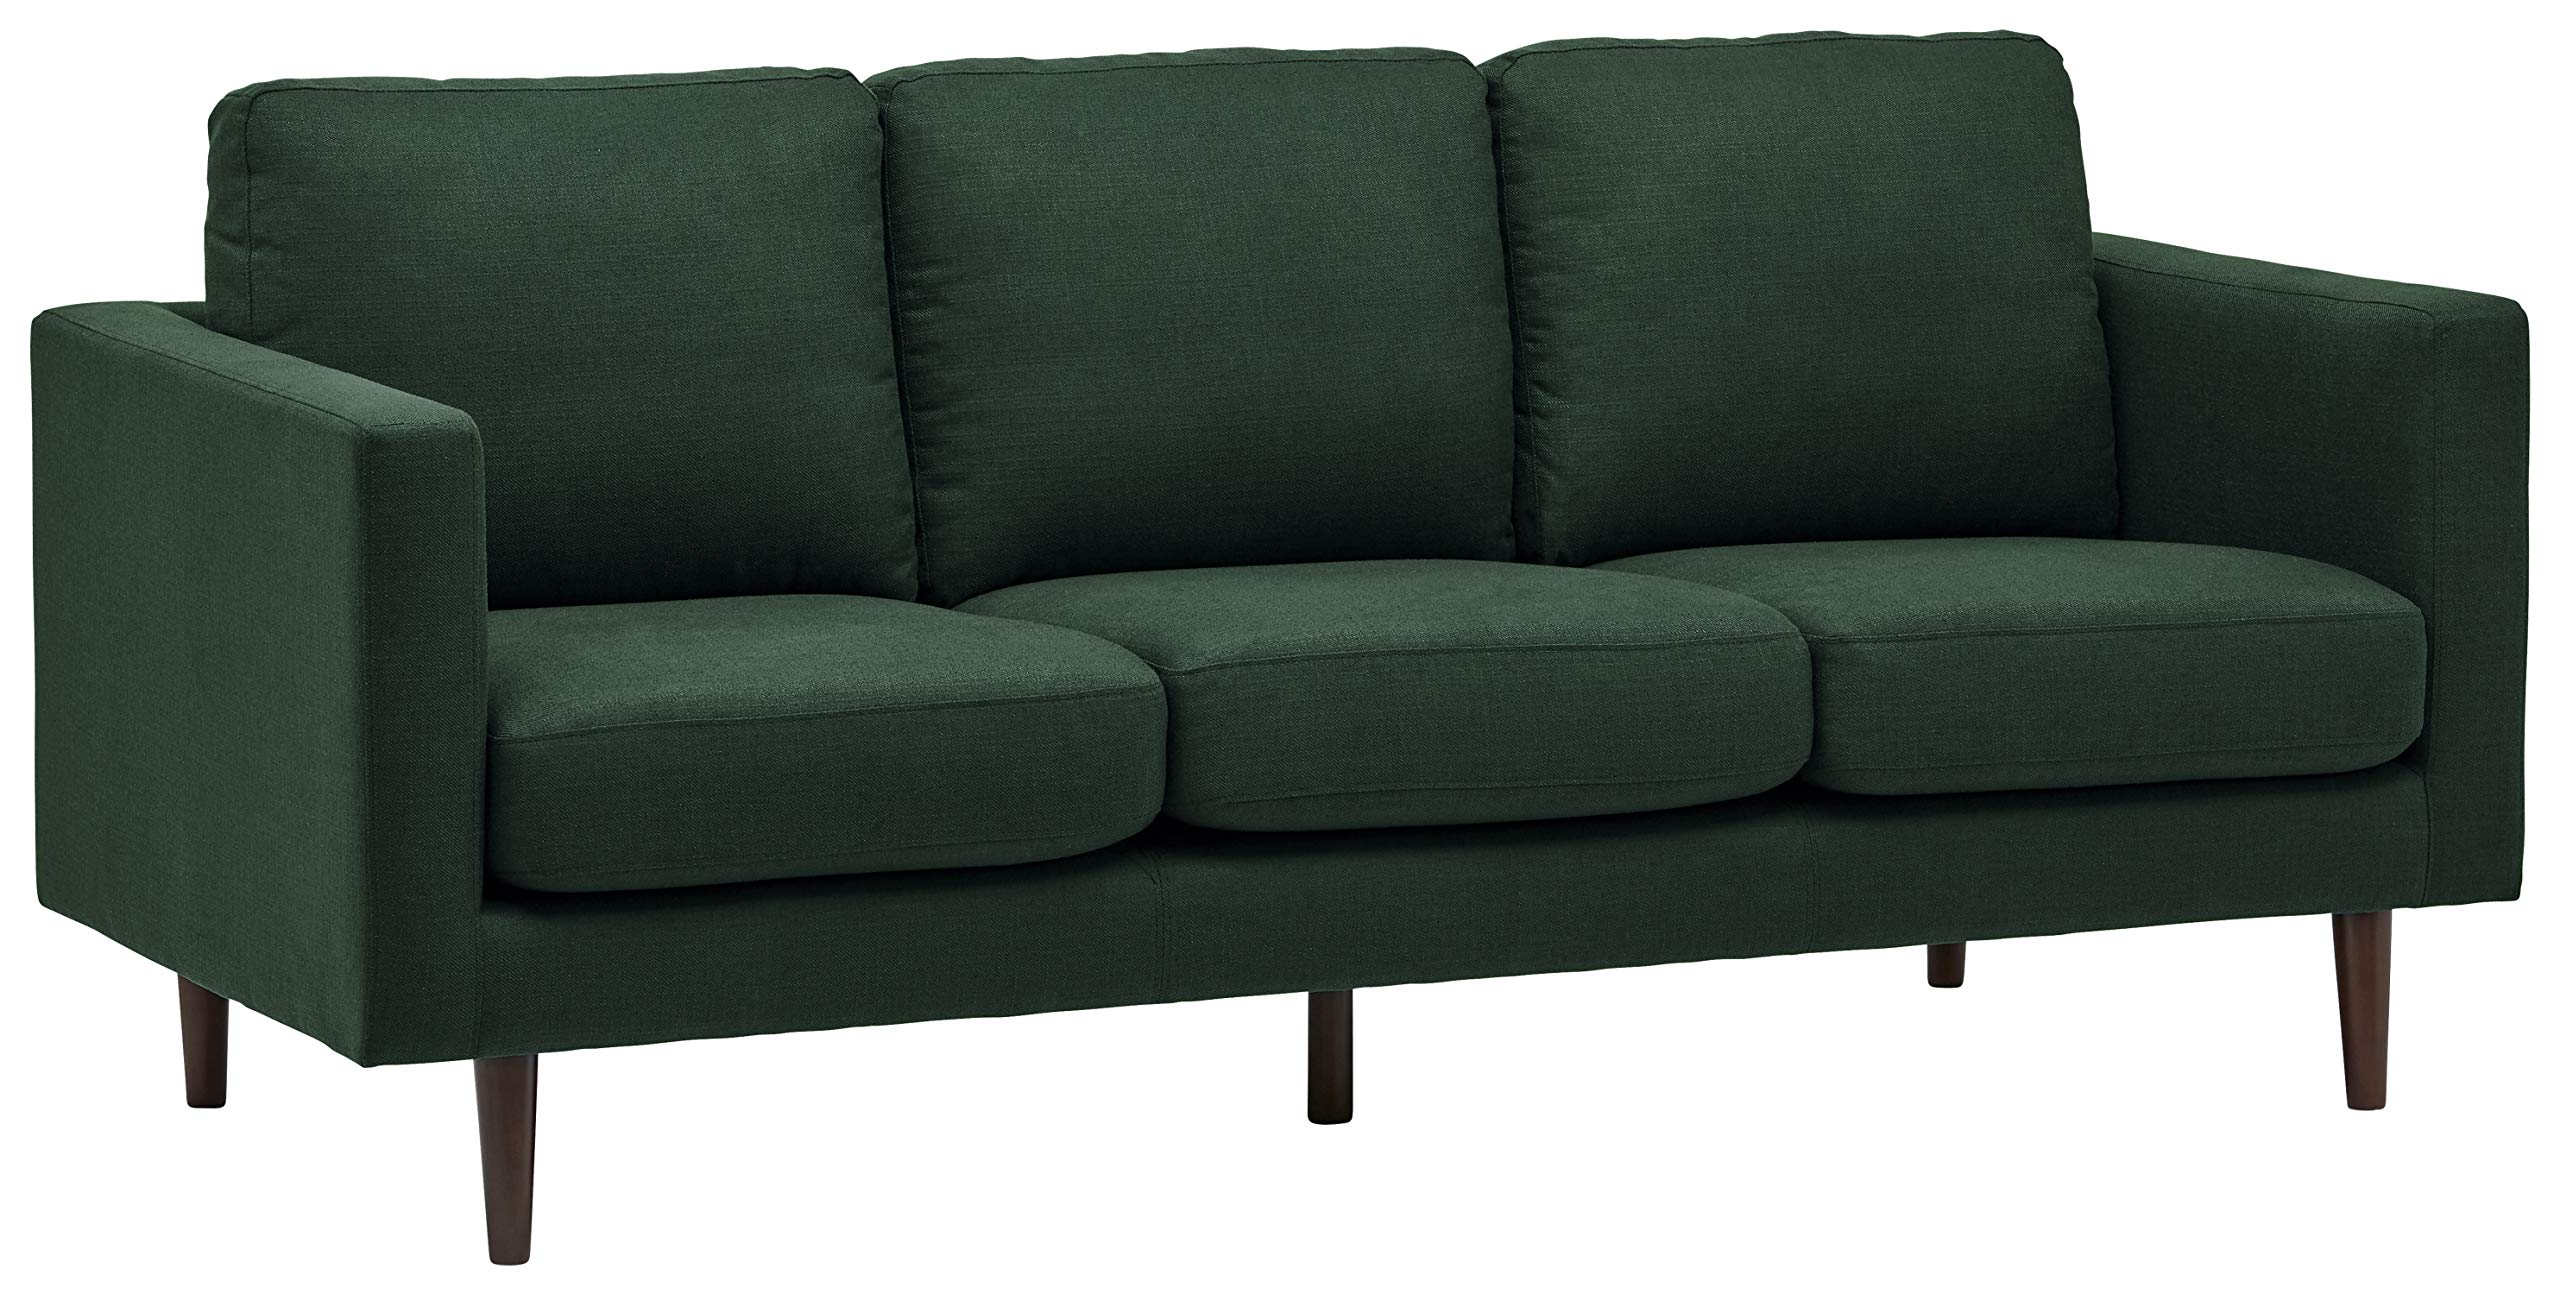 Rivet Revolve Modern Upholstered Sofa with Tapered Legs, 79.9''W, Heritage Green by Rivet